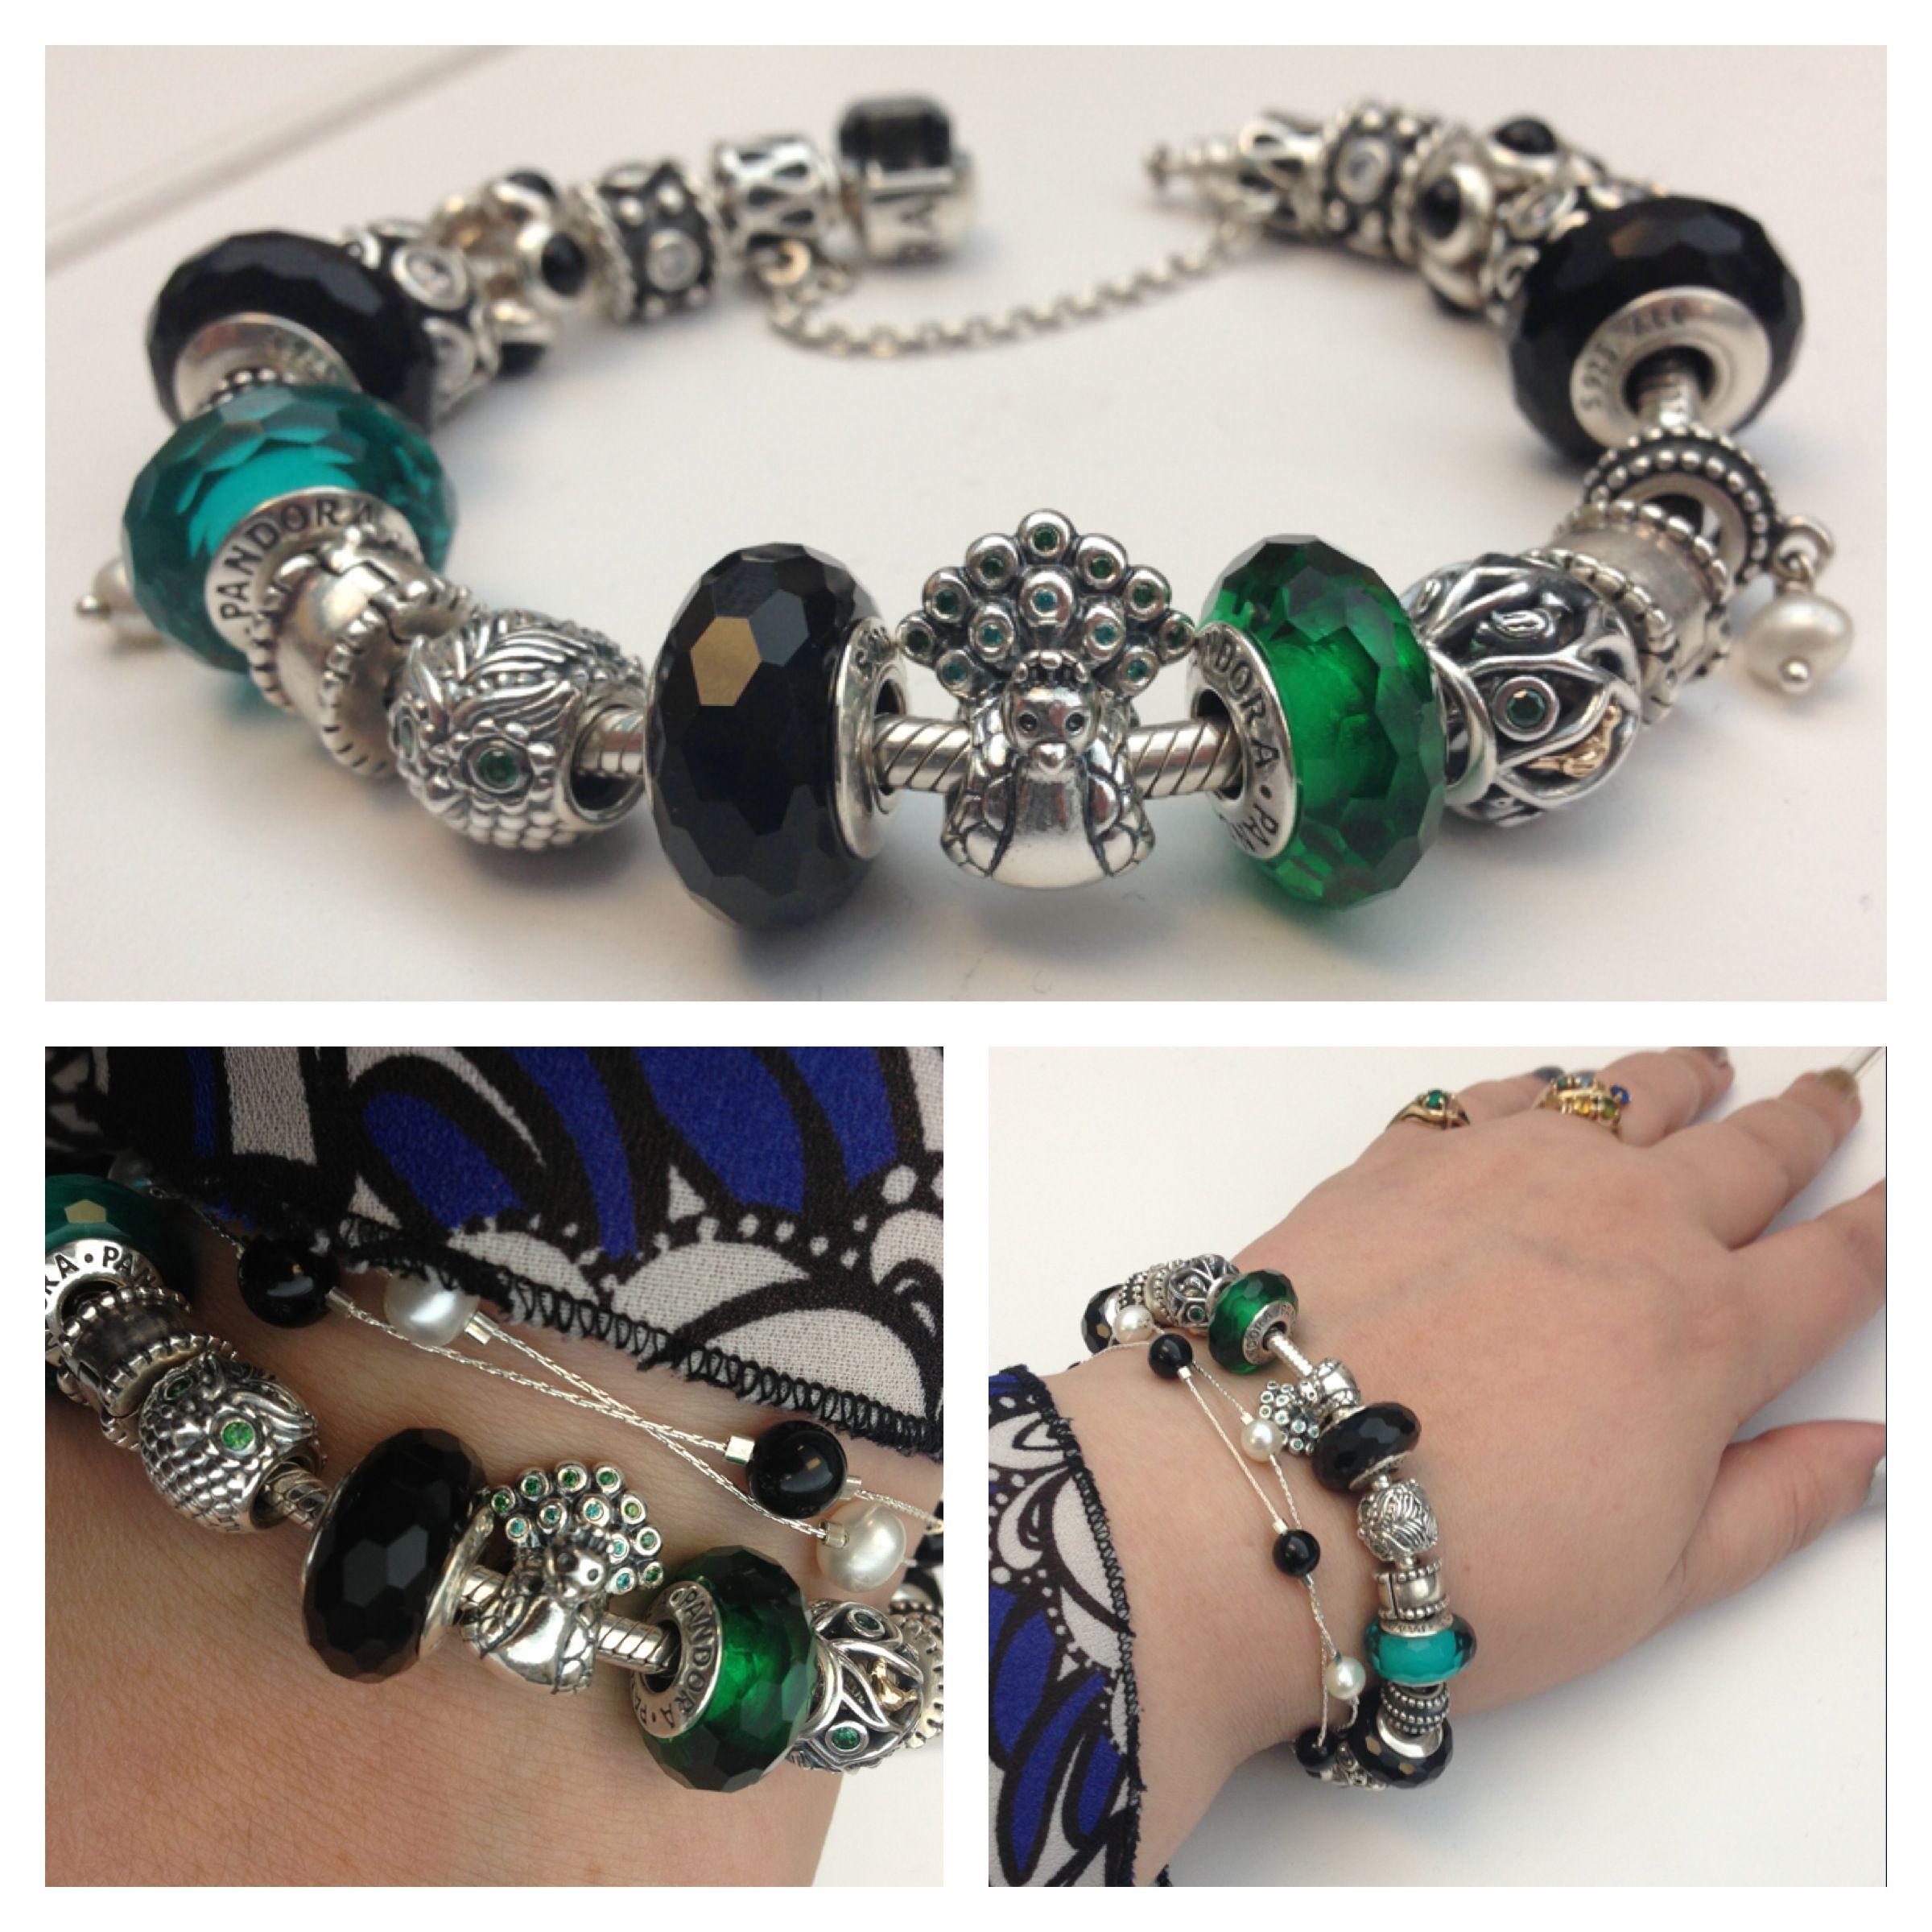 Pandora Charms Bracelets: My Peacock Themed Pandora Bracelet. @Pandora_NA #Pandora